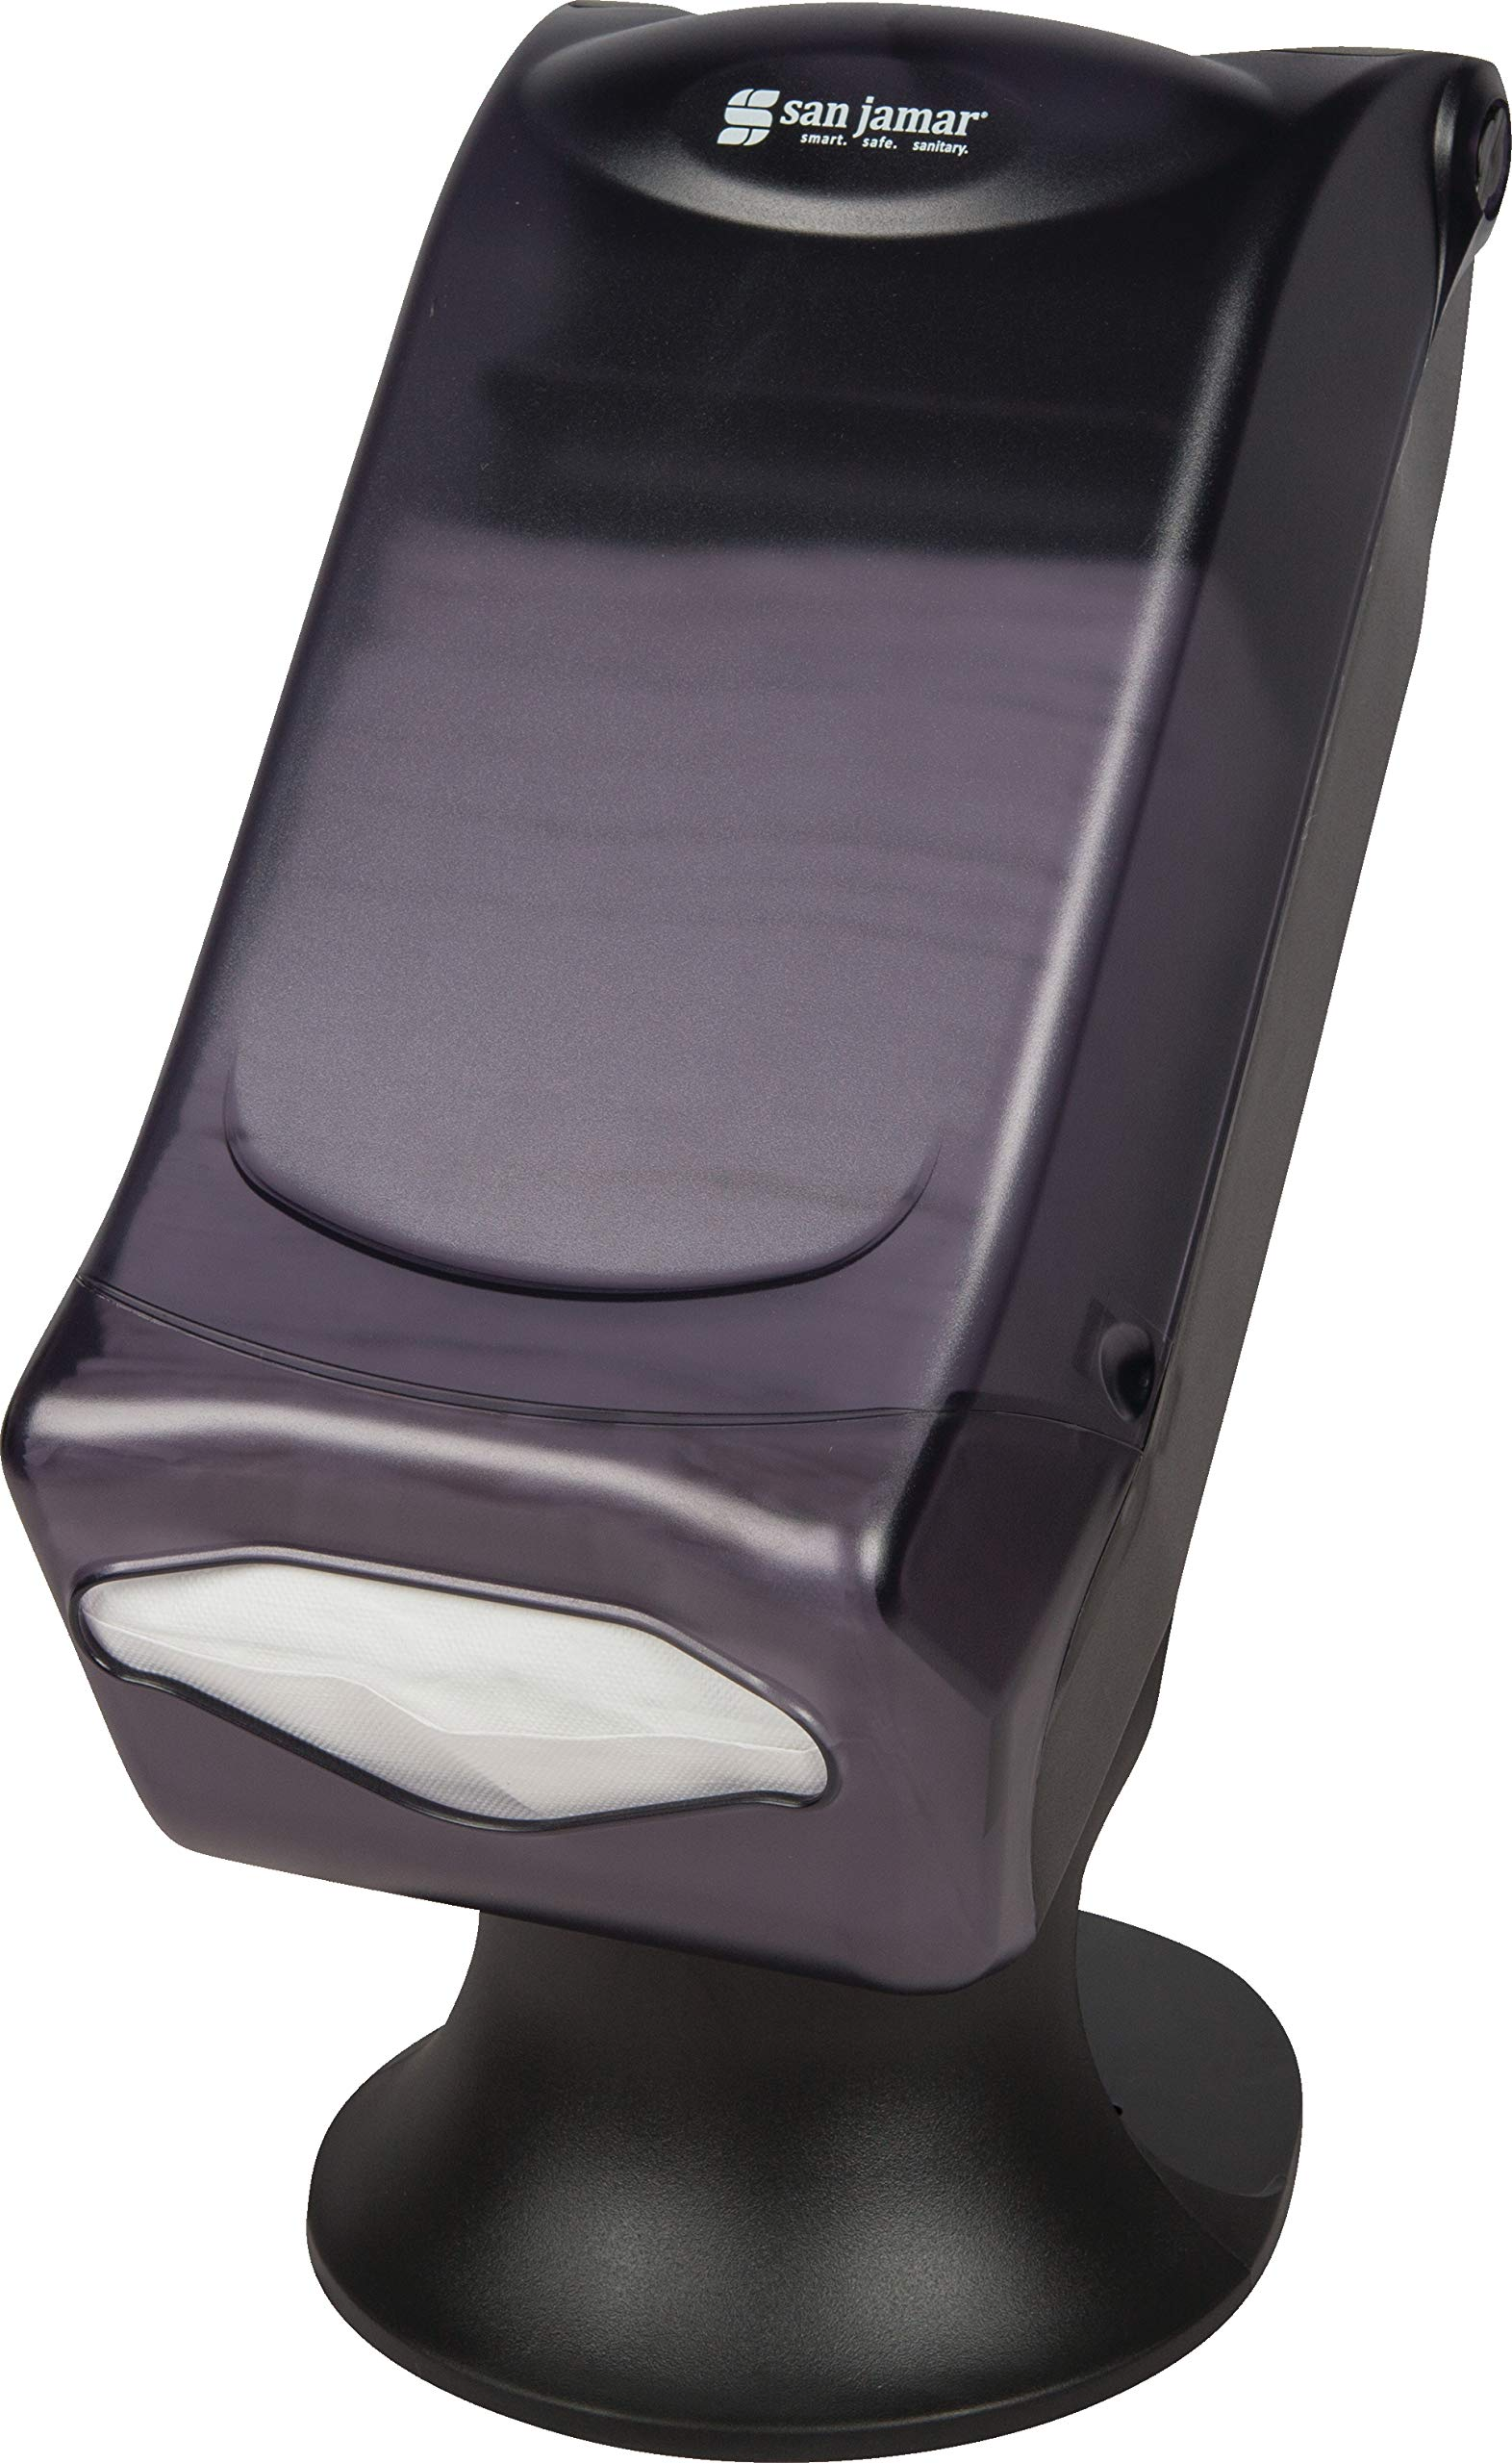 San Jamar H5005S Venue Fullfold Control Napkin Dispenser with Stand, 500 Capacity, 8'' Width x 17-1/2'' Height x 13'' Depth, Black Pearl by San Jamar (Image #5)